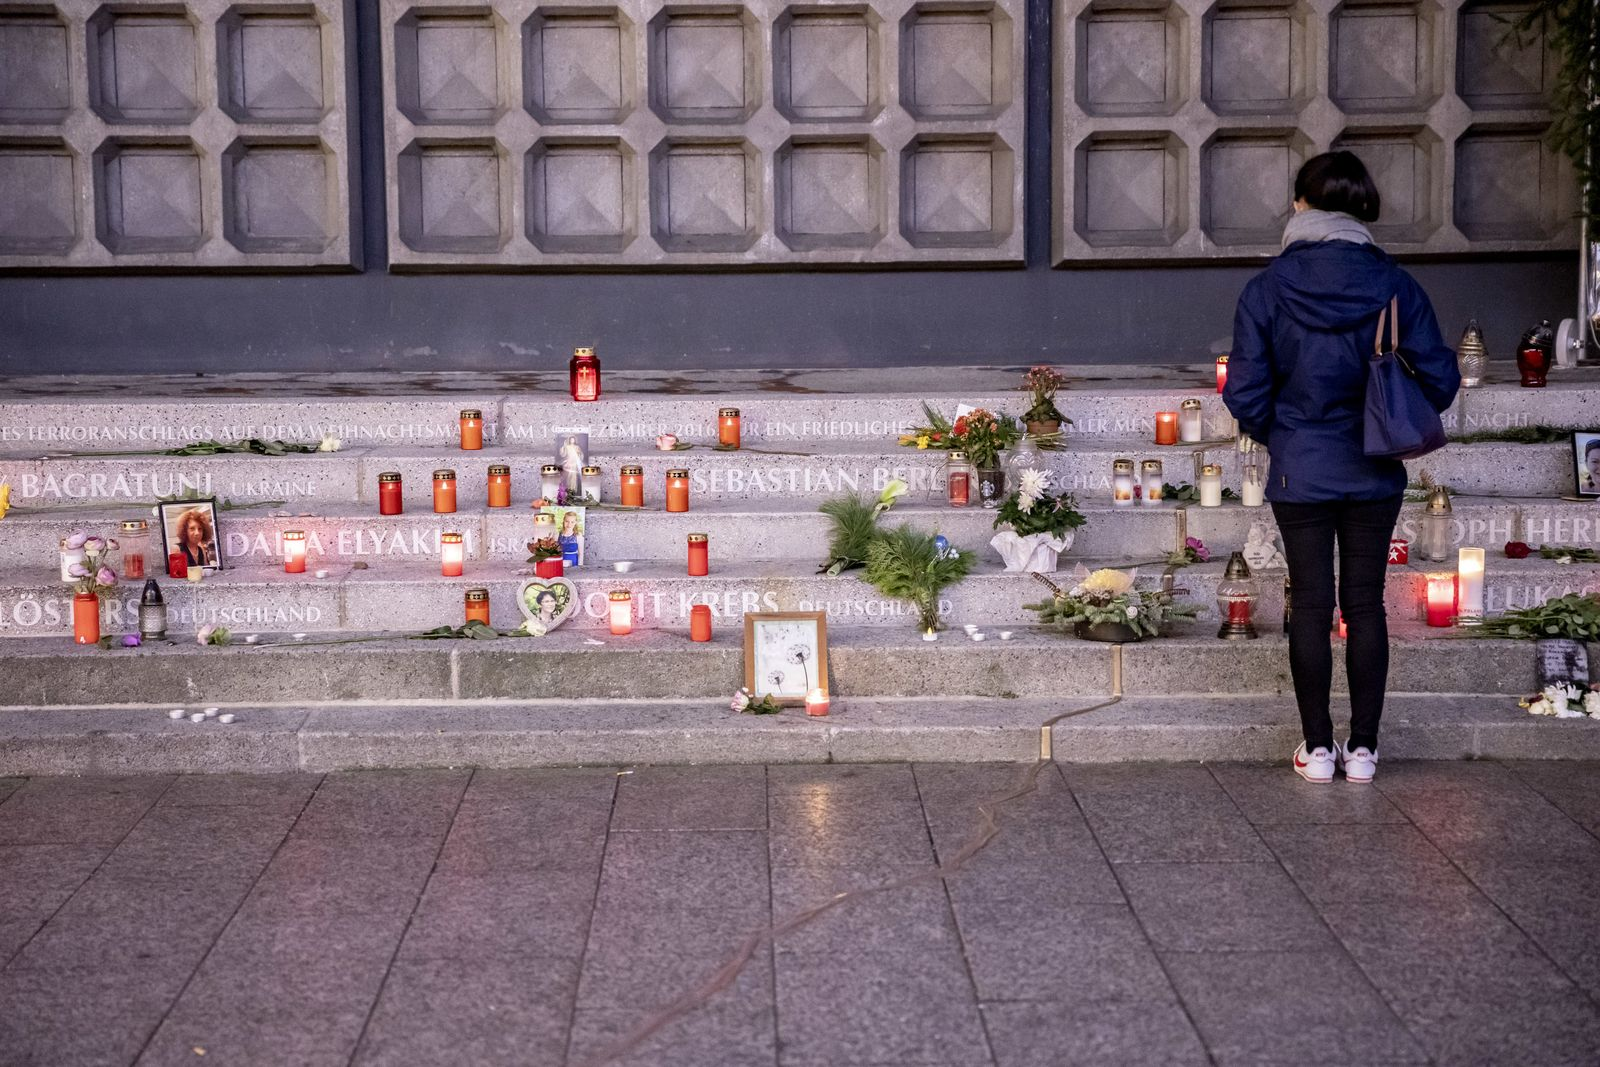 Gedenken an Opfer des Terroranschlags in Berlin 2016